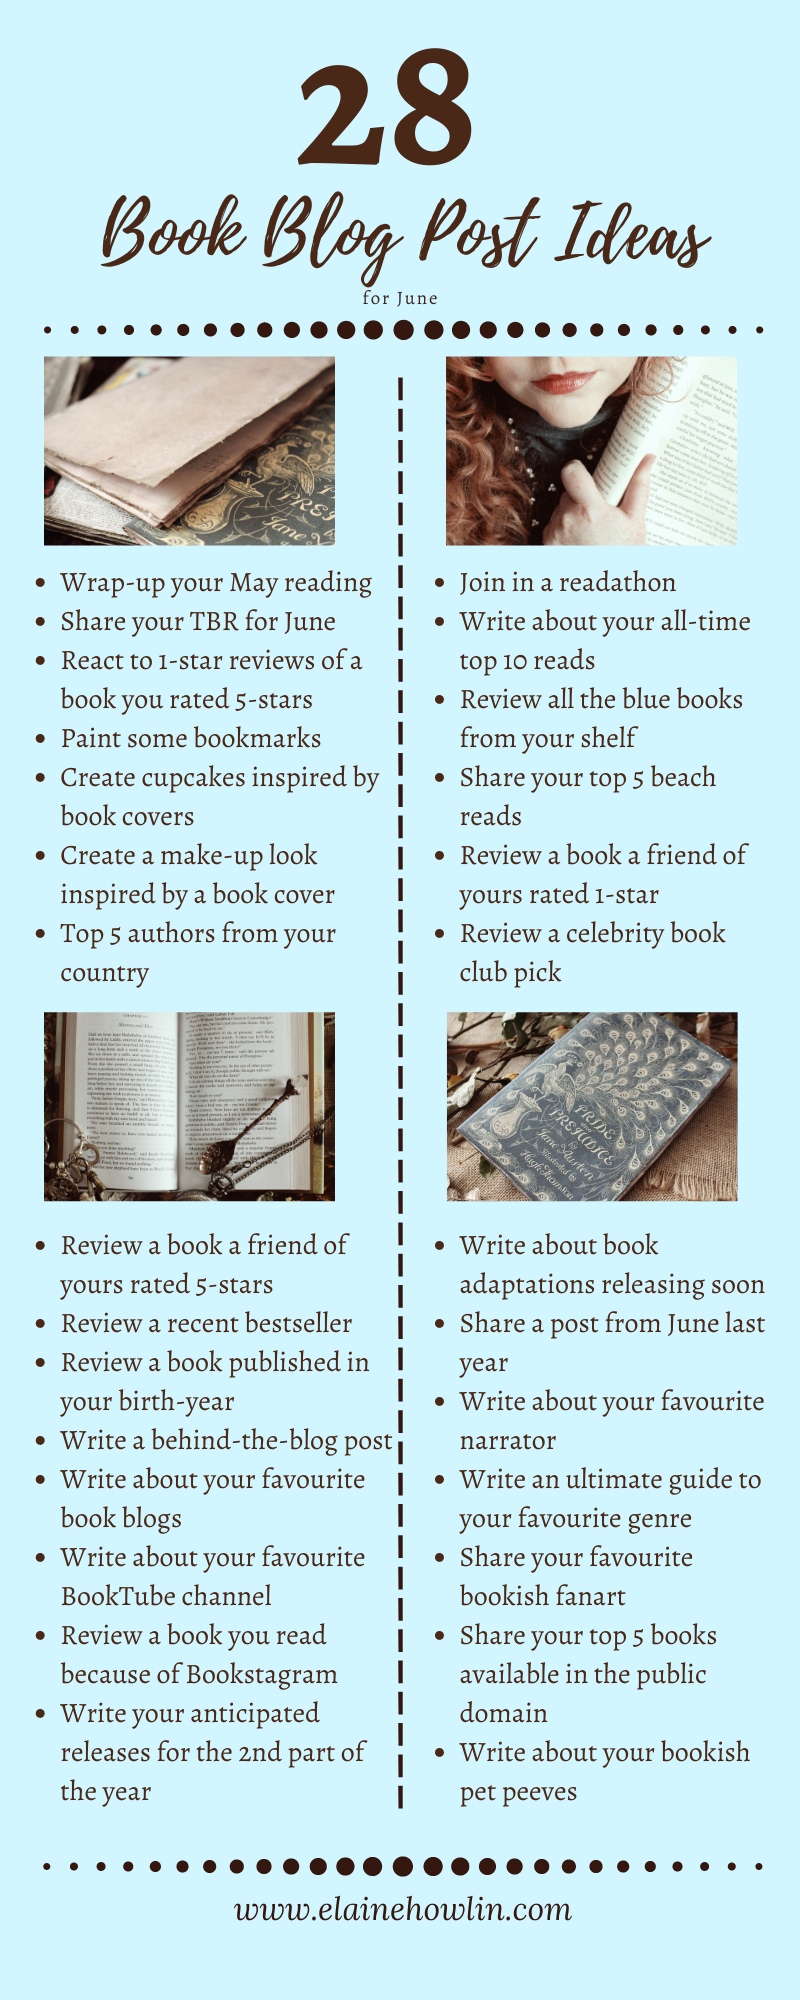 28 Book Blog Post Ideas for June Infographic Elaine Howlin